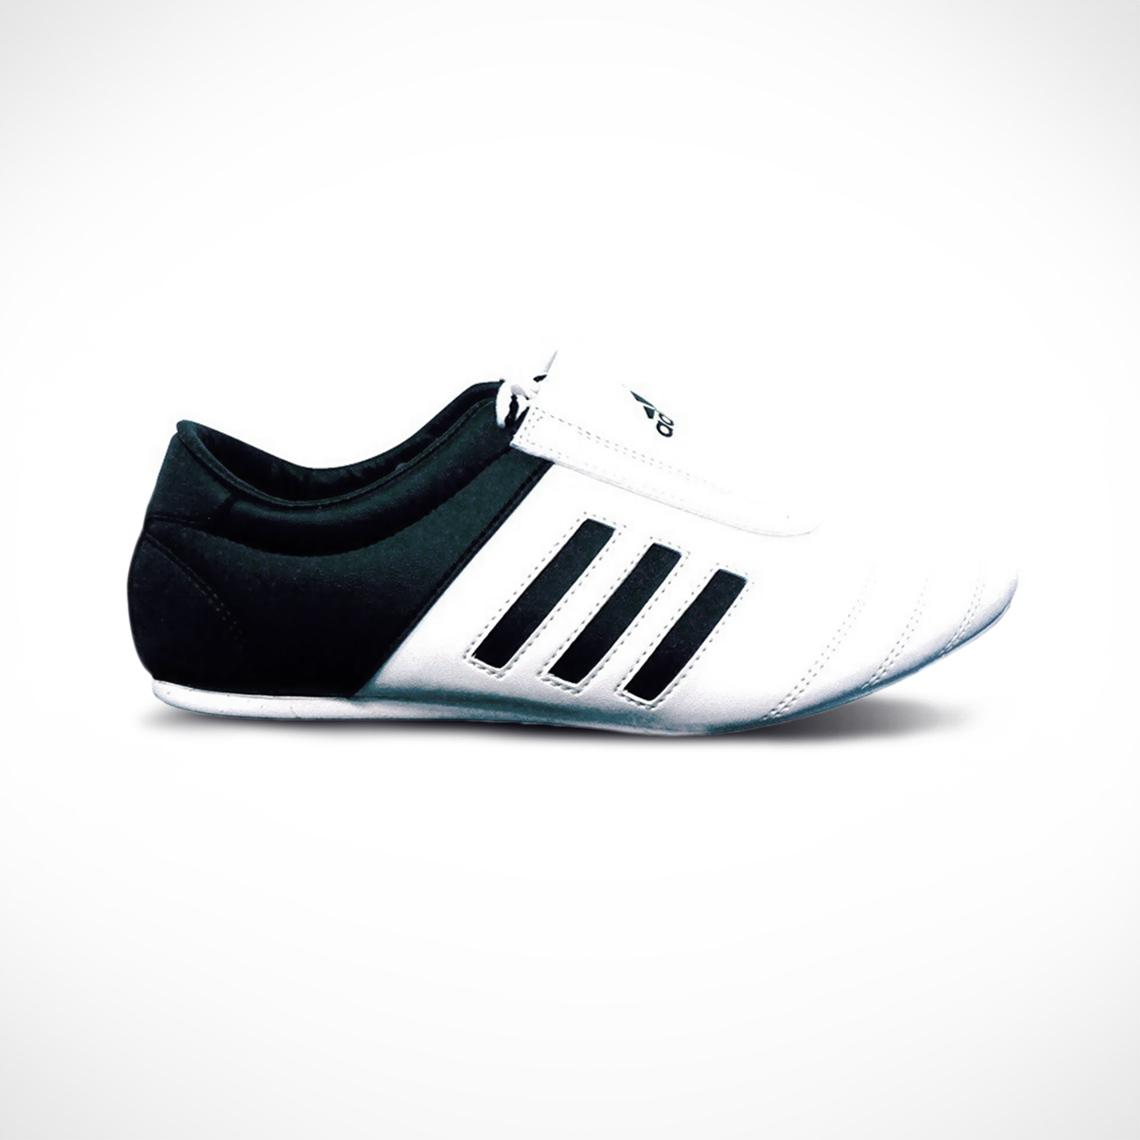 adidas – ADI KICK II Taekwondo shoes